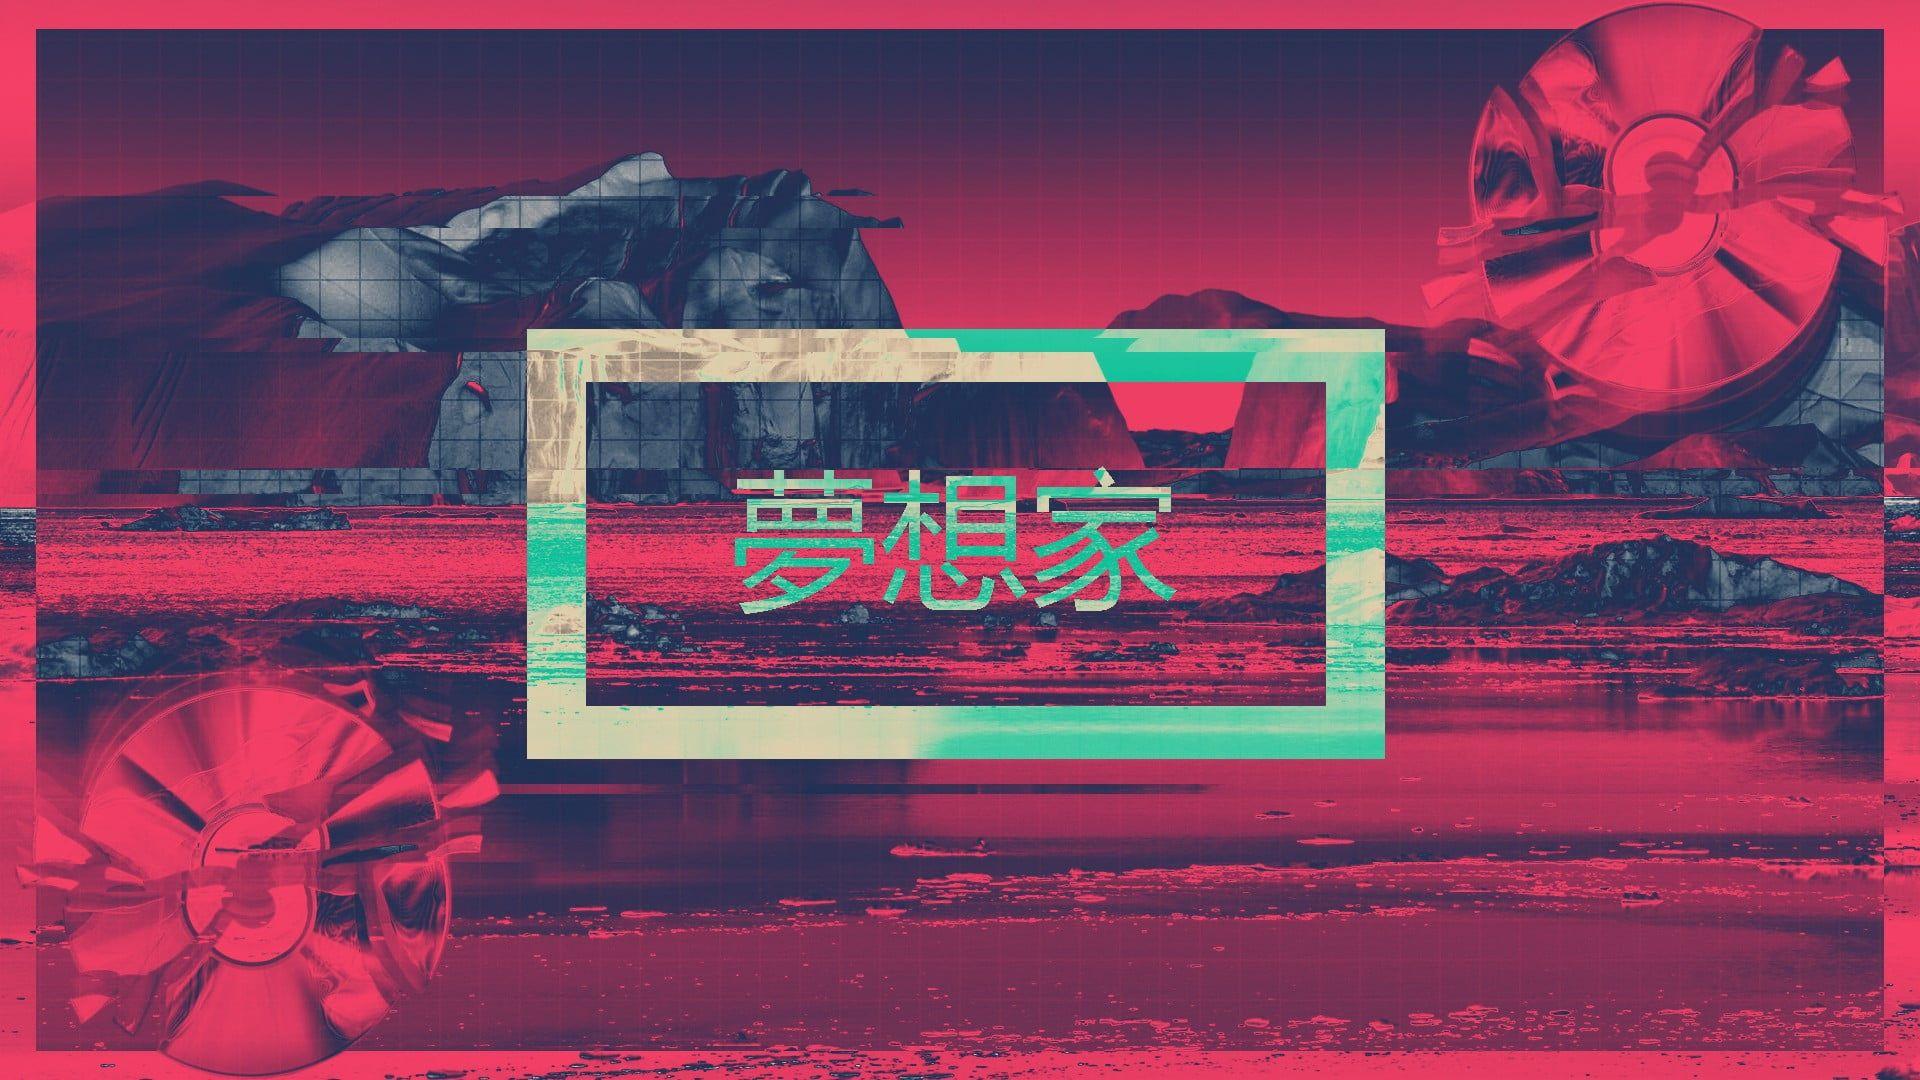 Red And Teal Wallpaper Vaporwave Pixel Art 1980s Texture Neon Text Neon 1080p Wallpa In 2020 Aesthetic Desktop Wallpaper Vaporwave Wallpaper Aesthetic Wallpapers